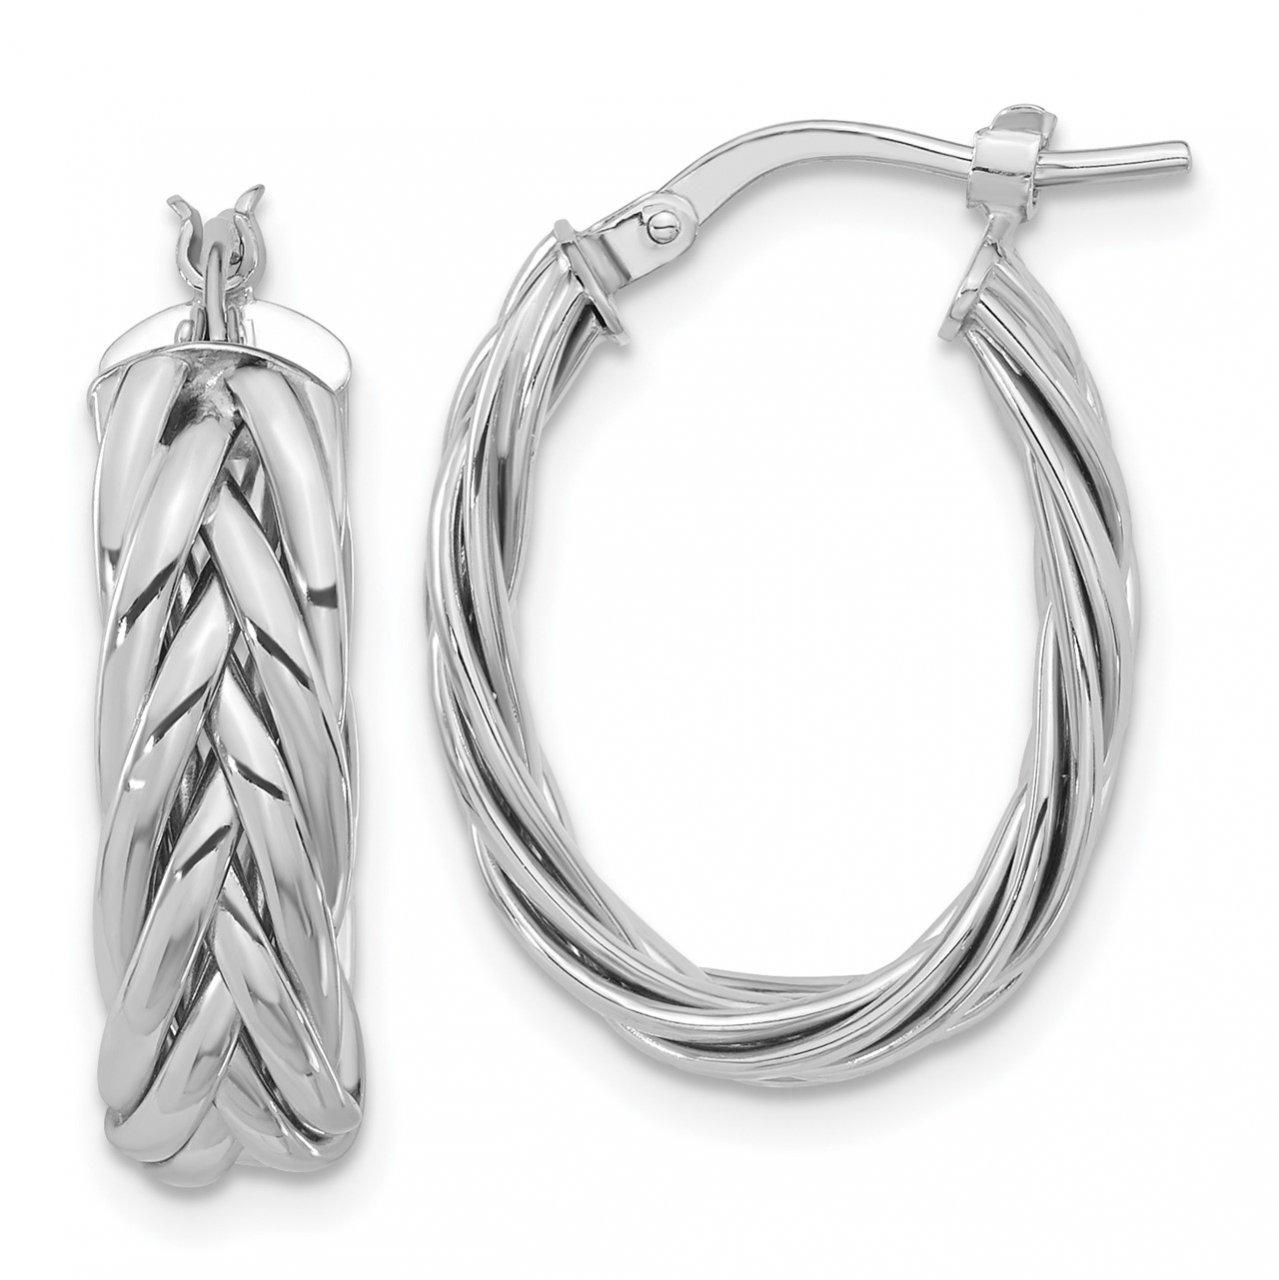 14k White Polished Braided Med Oval Hoop Earrings